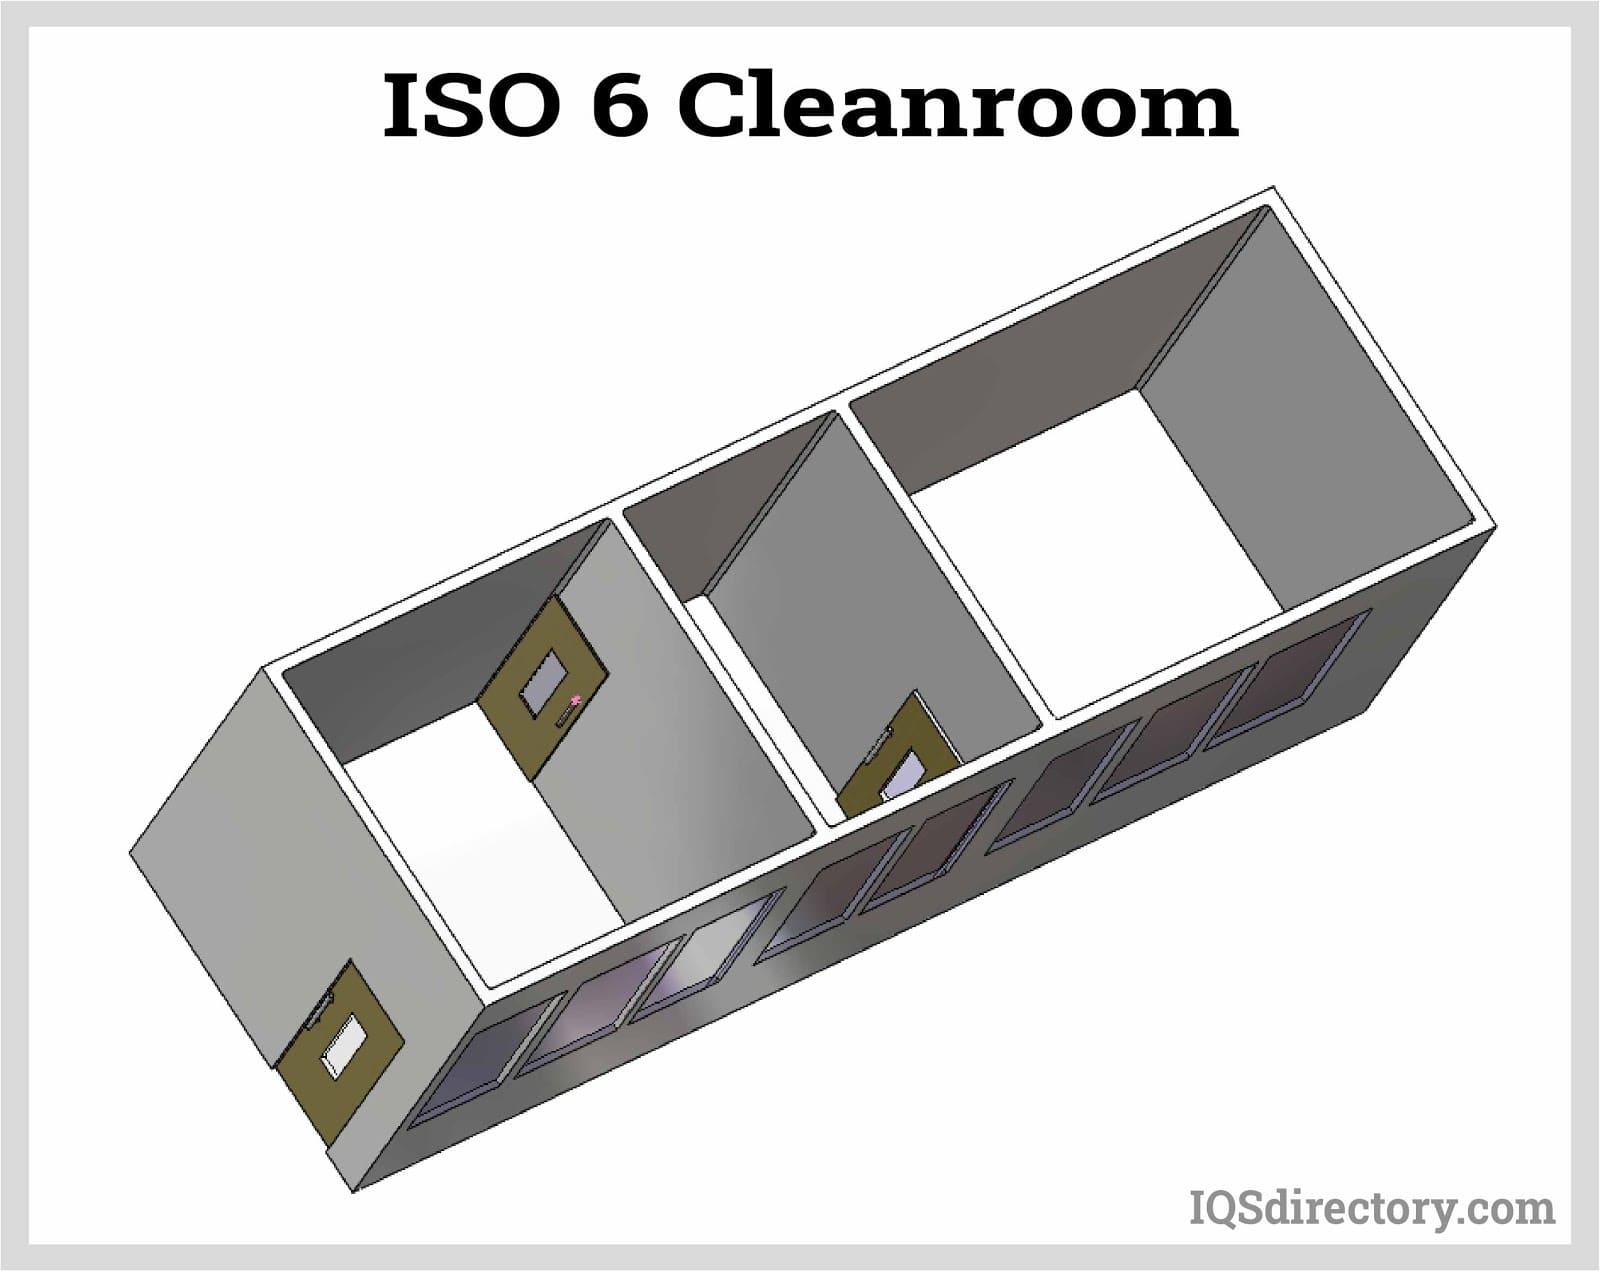 ISO 6 Cleanroom